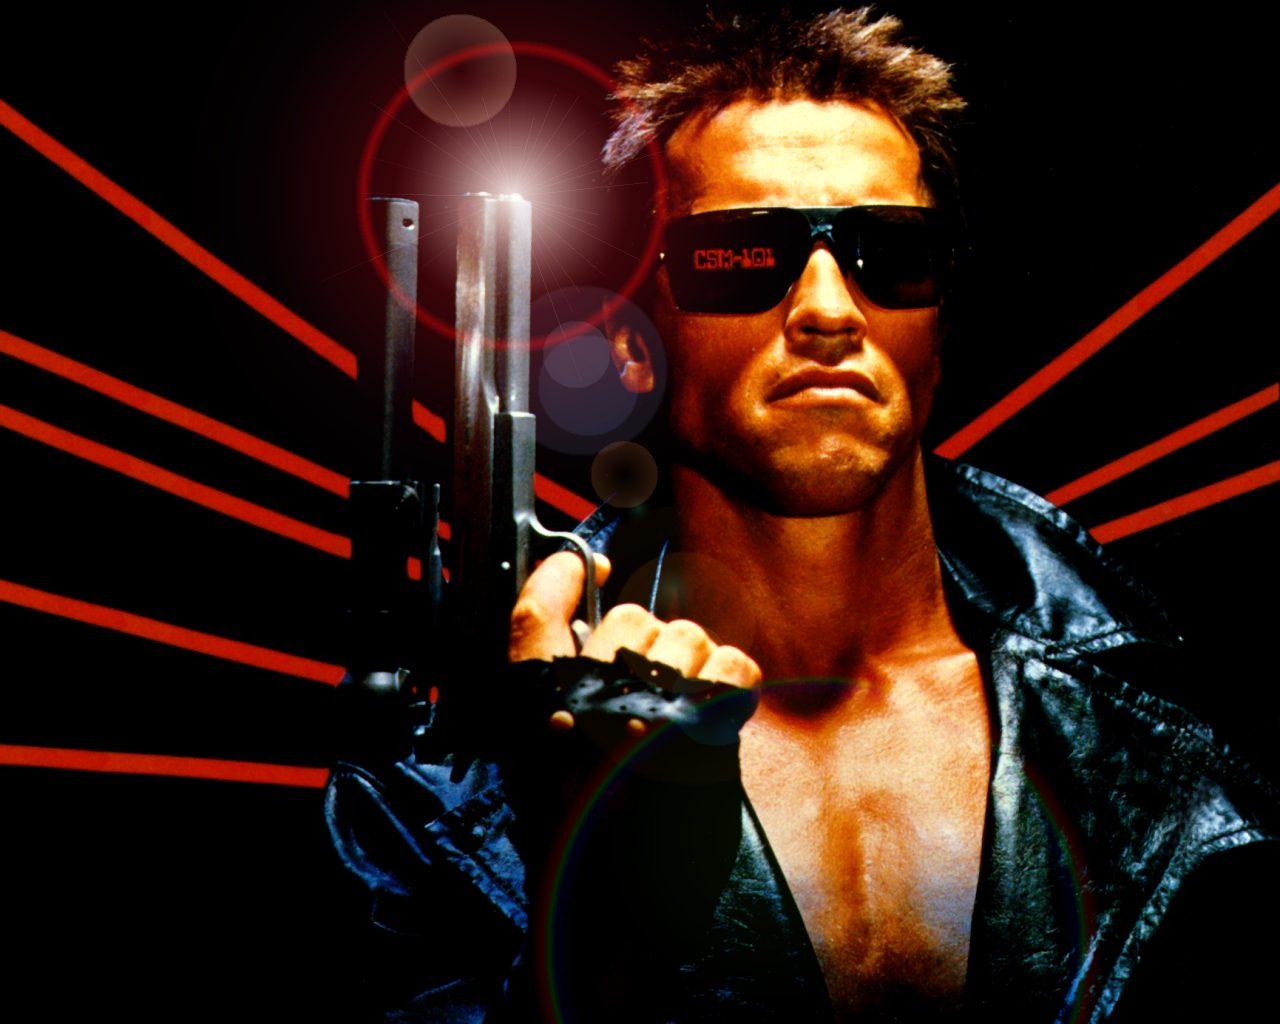 http://1.bp.blogspot.com/-1-qFWZkKTuc/TxccKtUewWI/AAAAAAAAByI/PVyB0SrUUh4/s1600/The_Terminator%25252C_1984%25252C_Arnold_Schwarzenegger.jpg